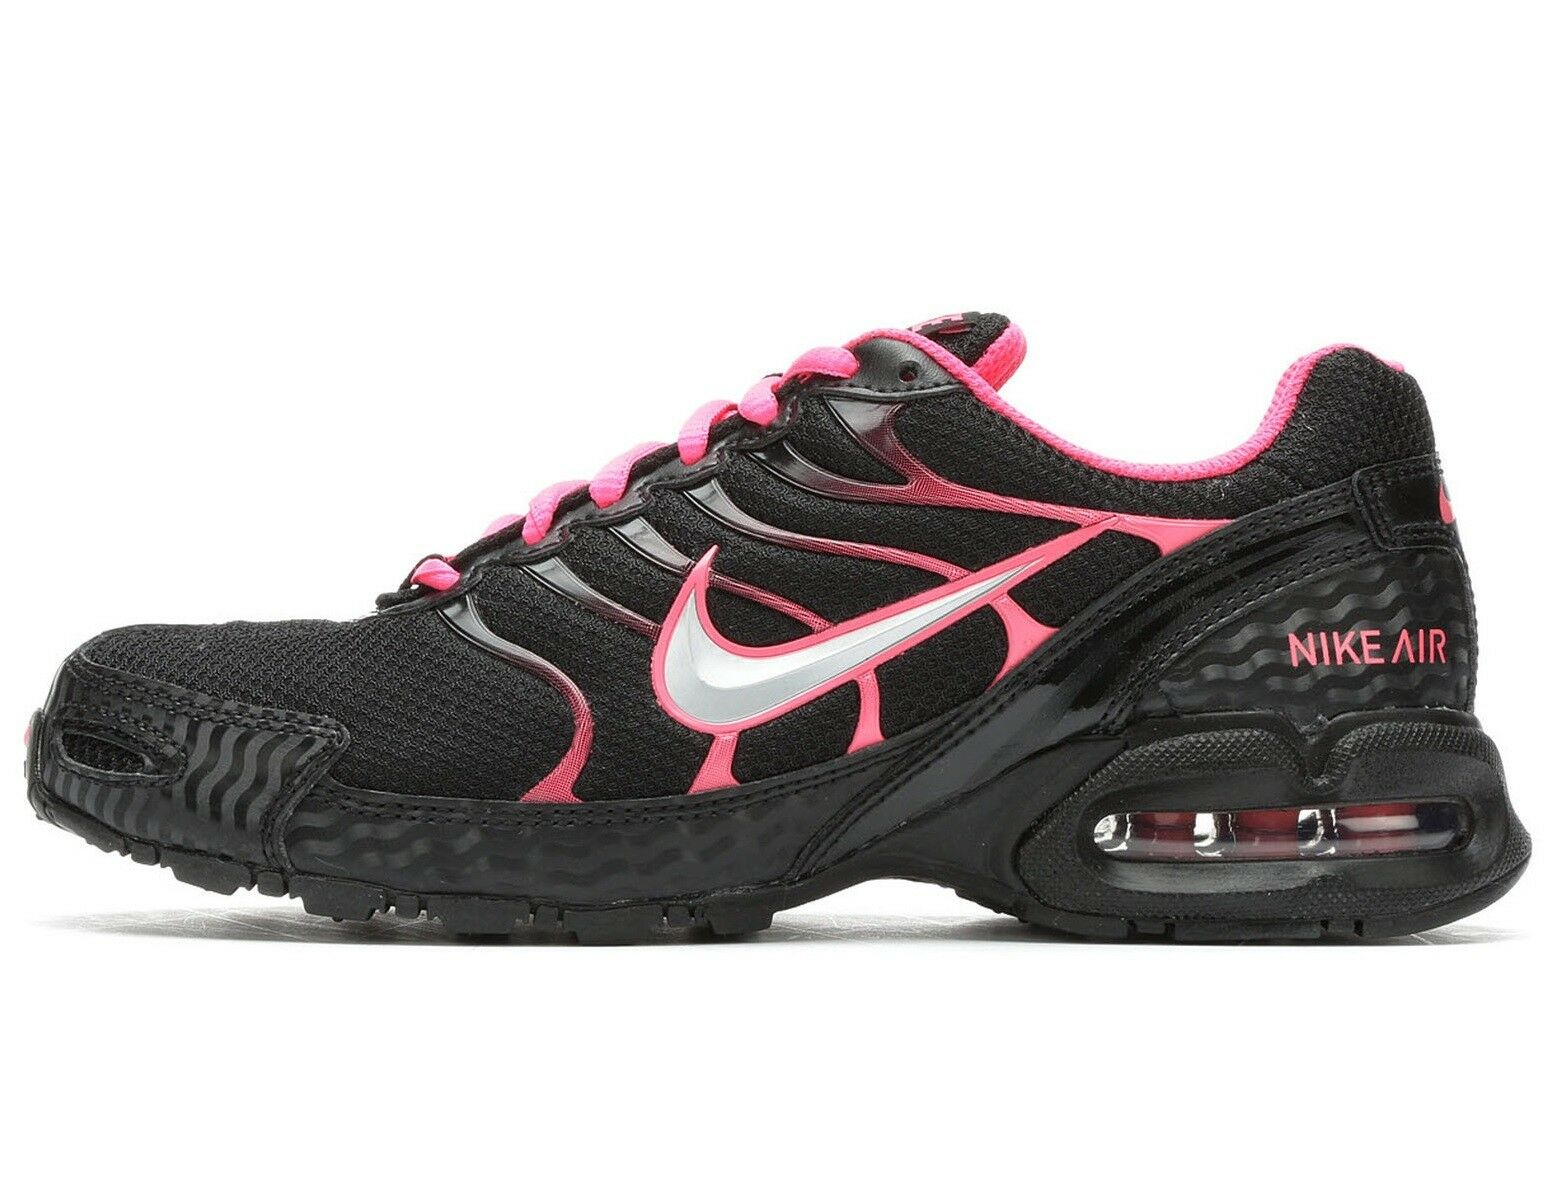 free shipping 9e15f 2dd89 Nike air max. 4 frauen frauen frauen 343851-006 schwarz - rosa - laufschuhe